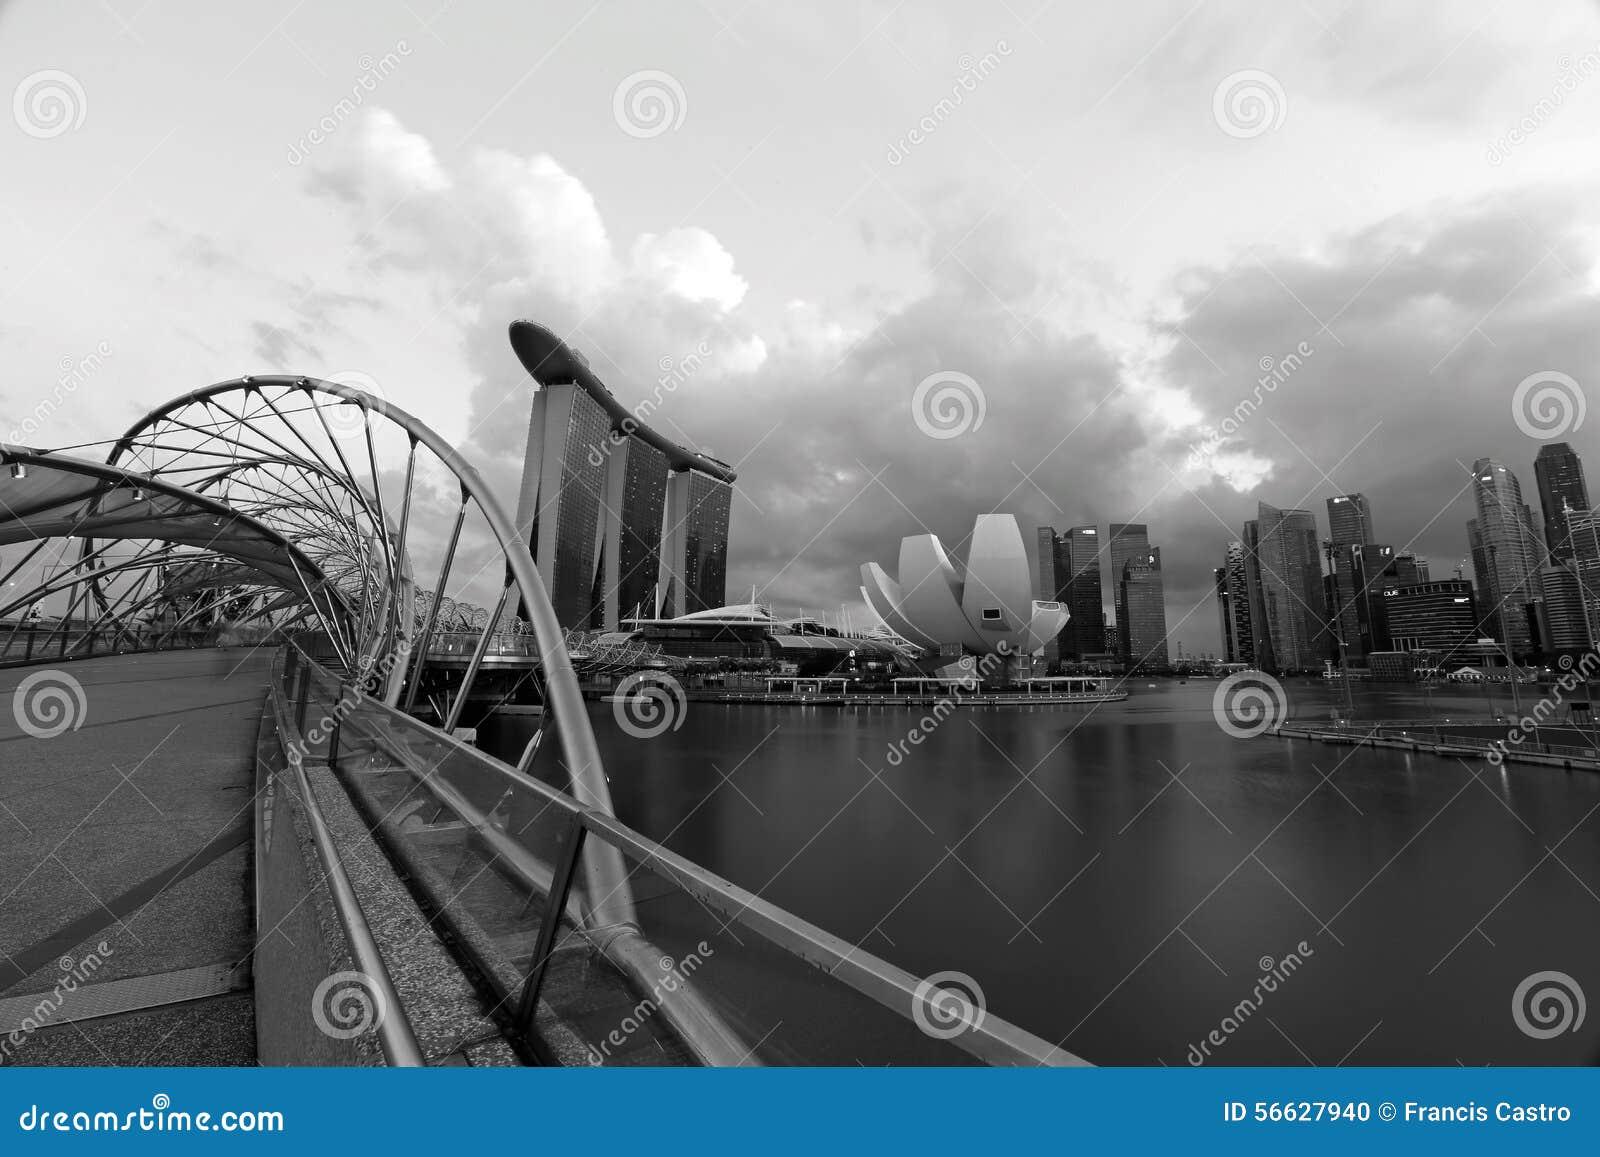 Helix bridge and the singapore marina bay signature skyline in black and white photo